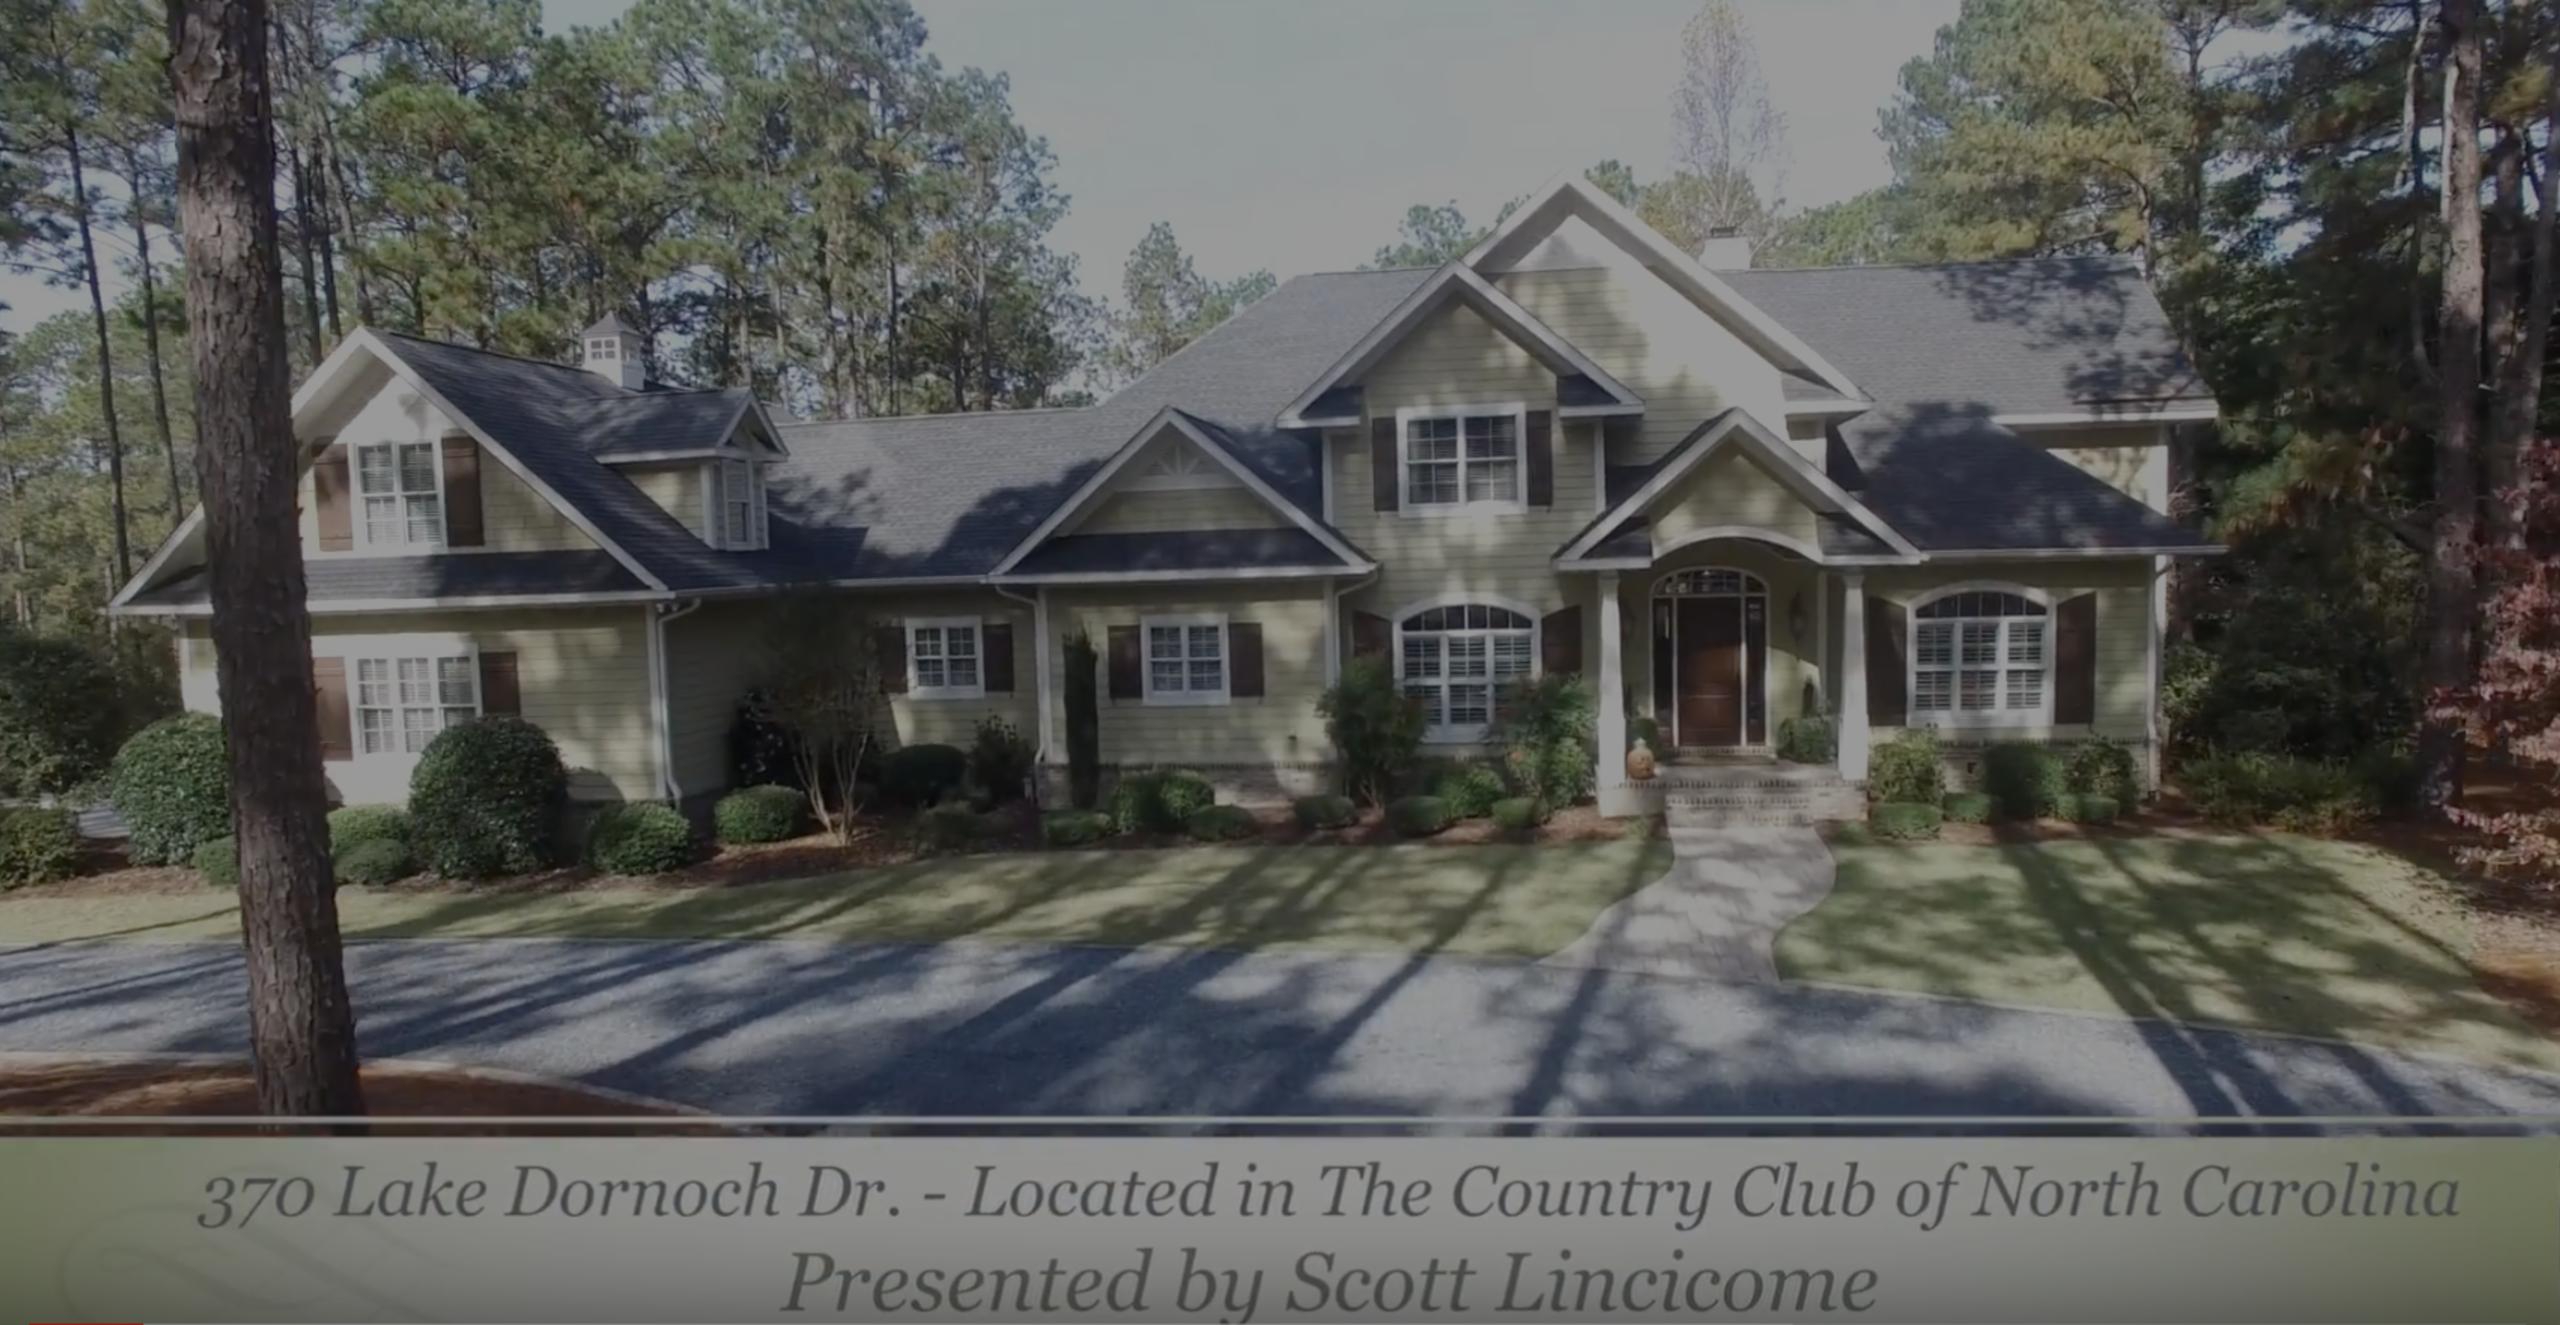 370 Lake Dornoch Road – Country Club of North Carolina